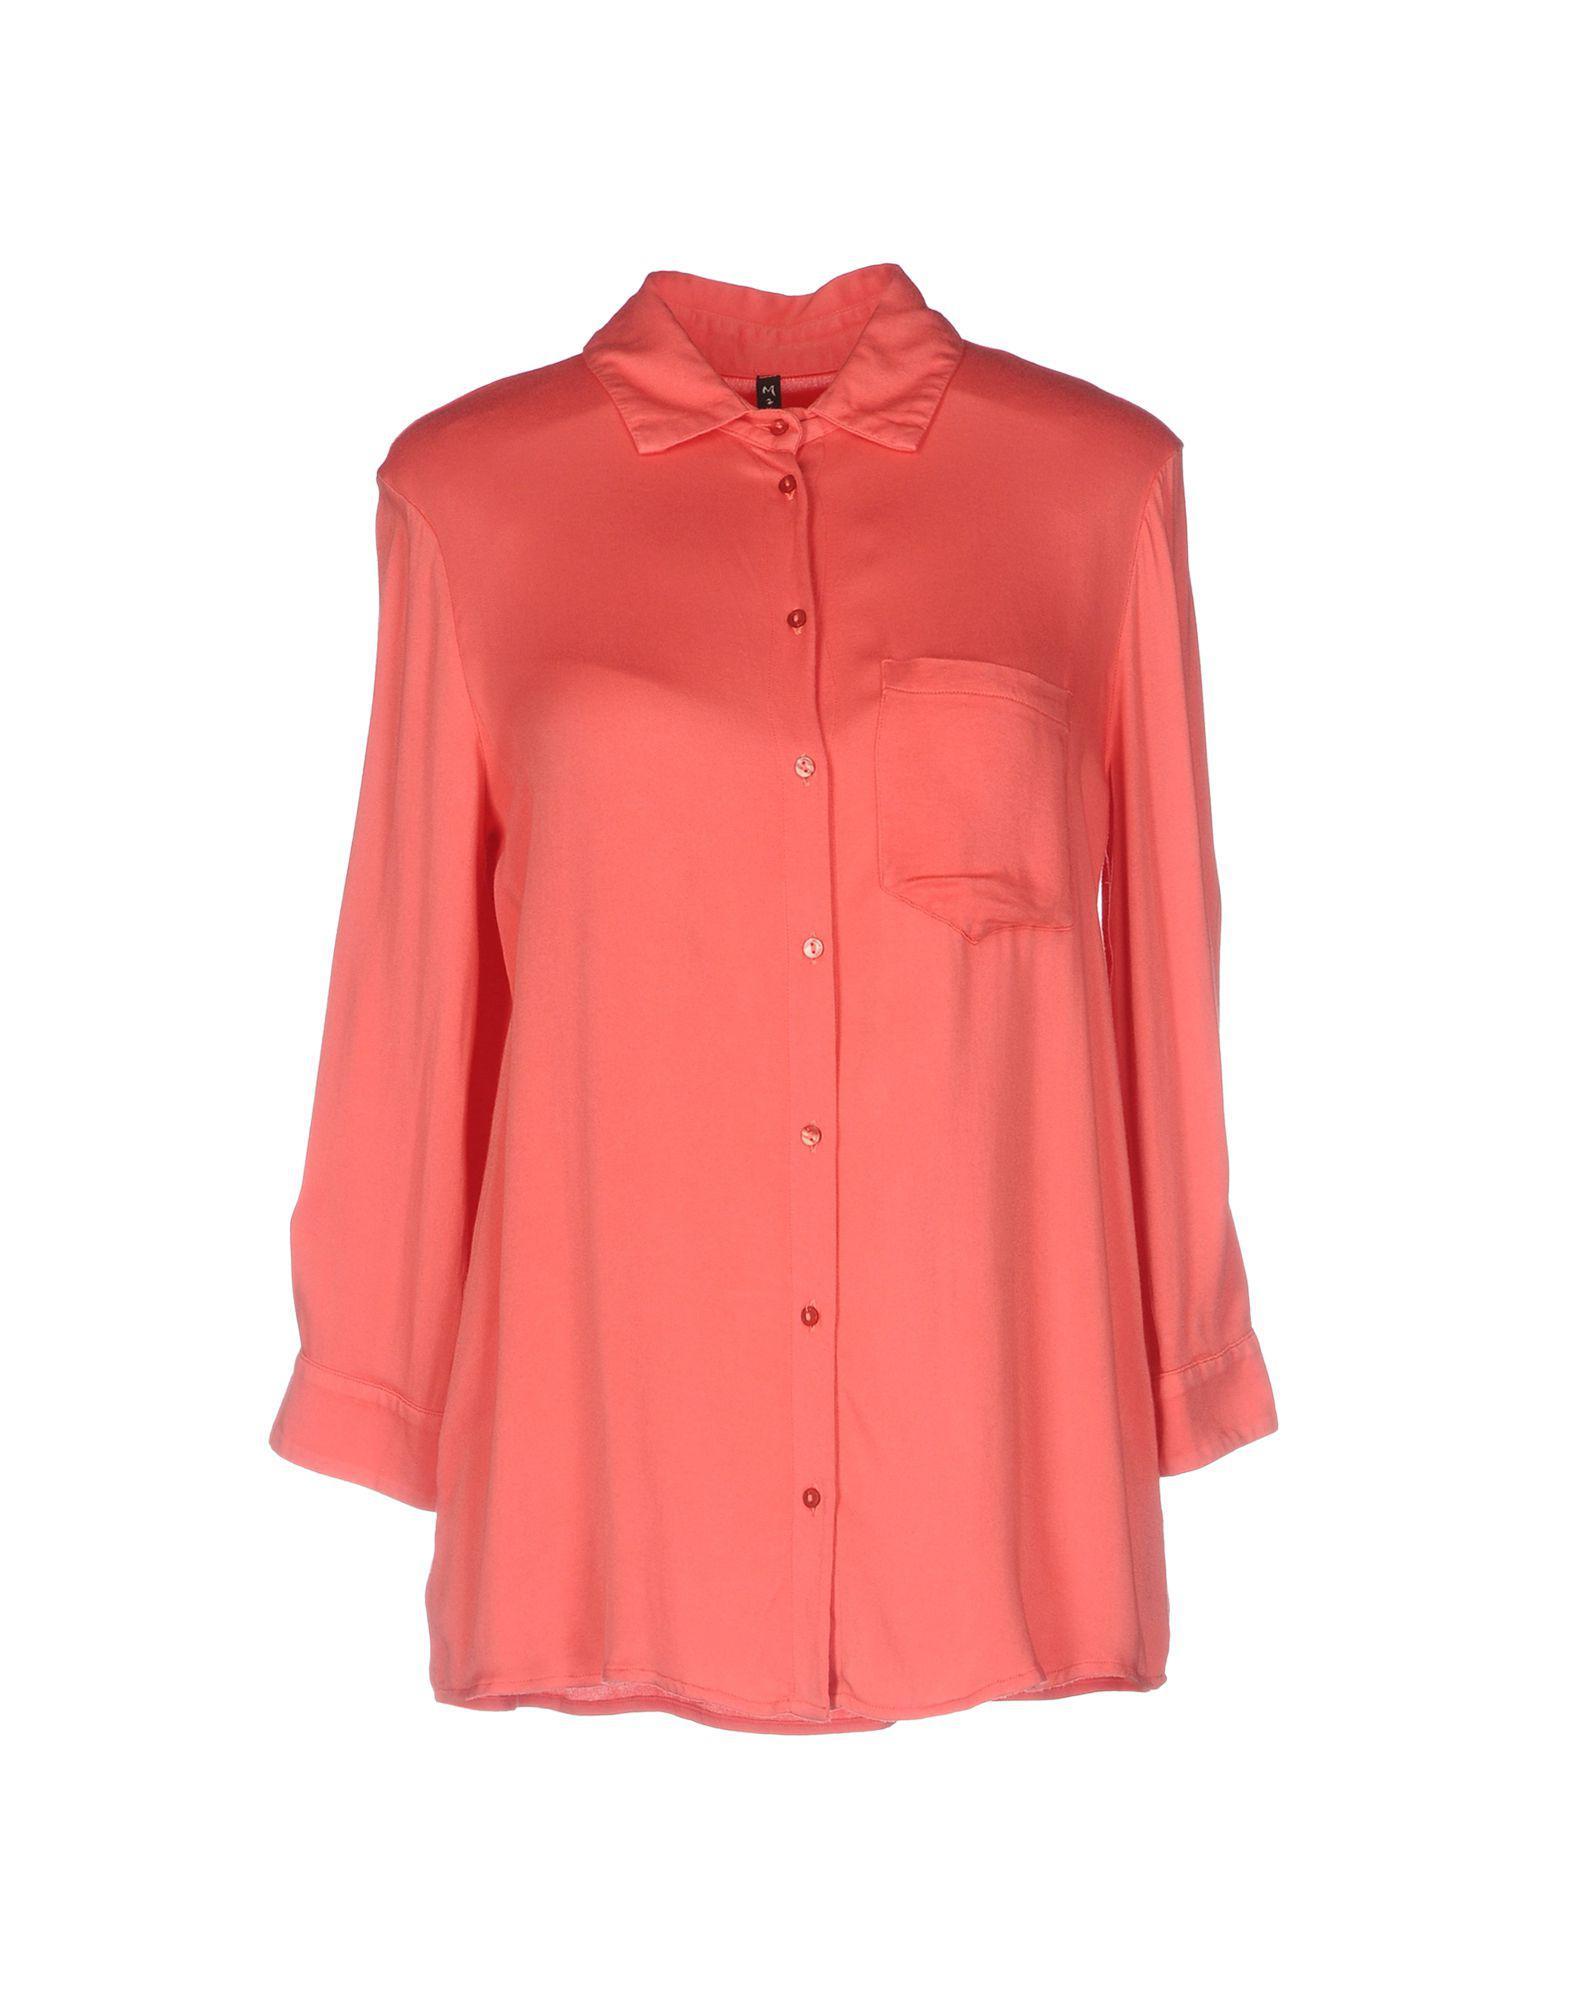 cc03456a53a07 Lyst - Manila Grace Shirt in Pink